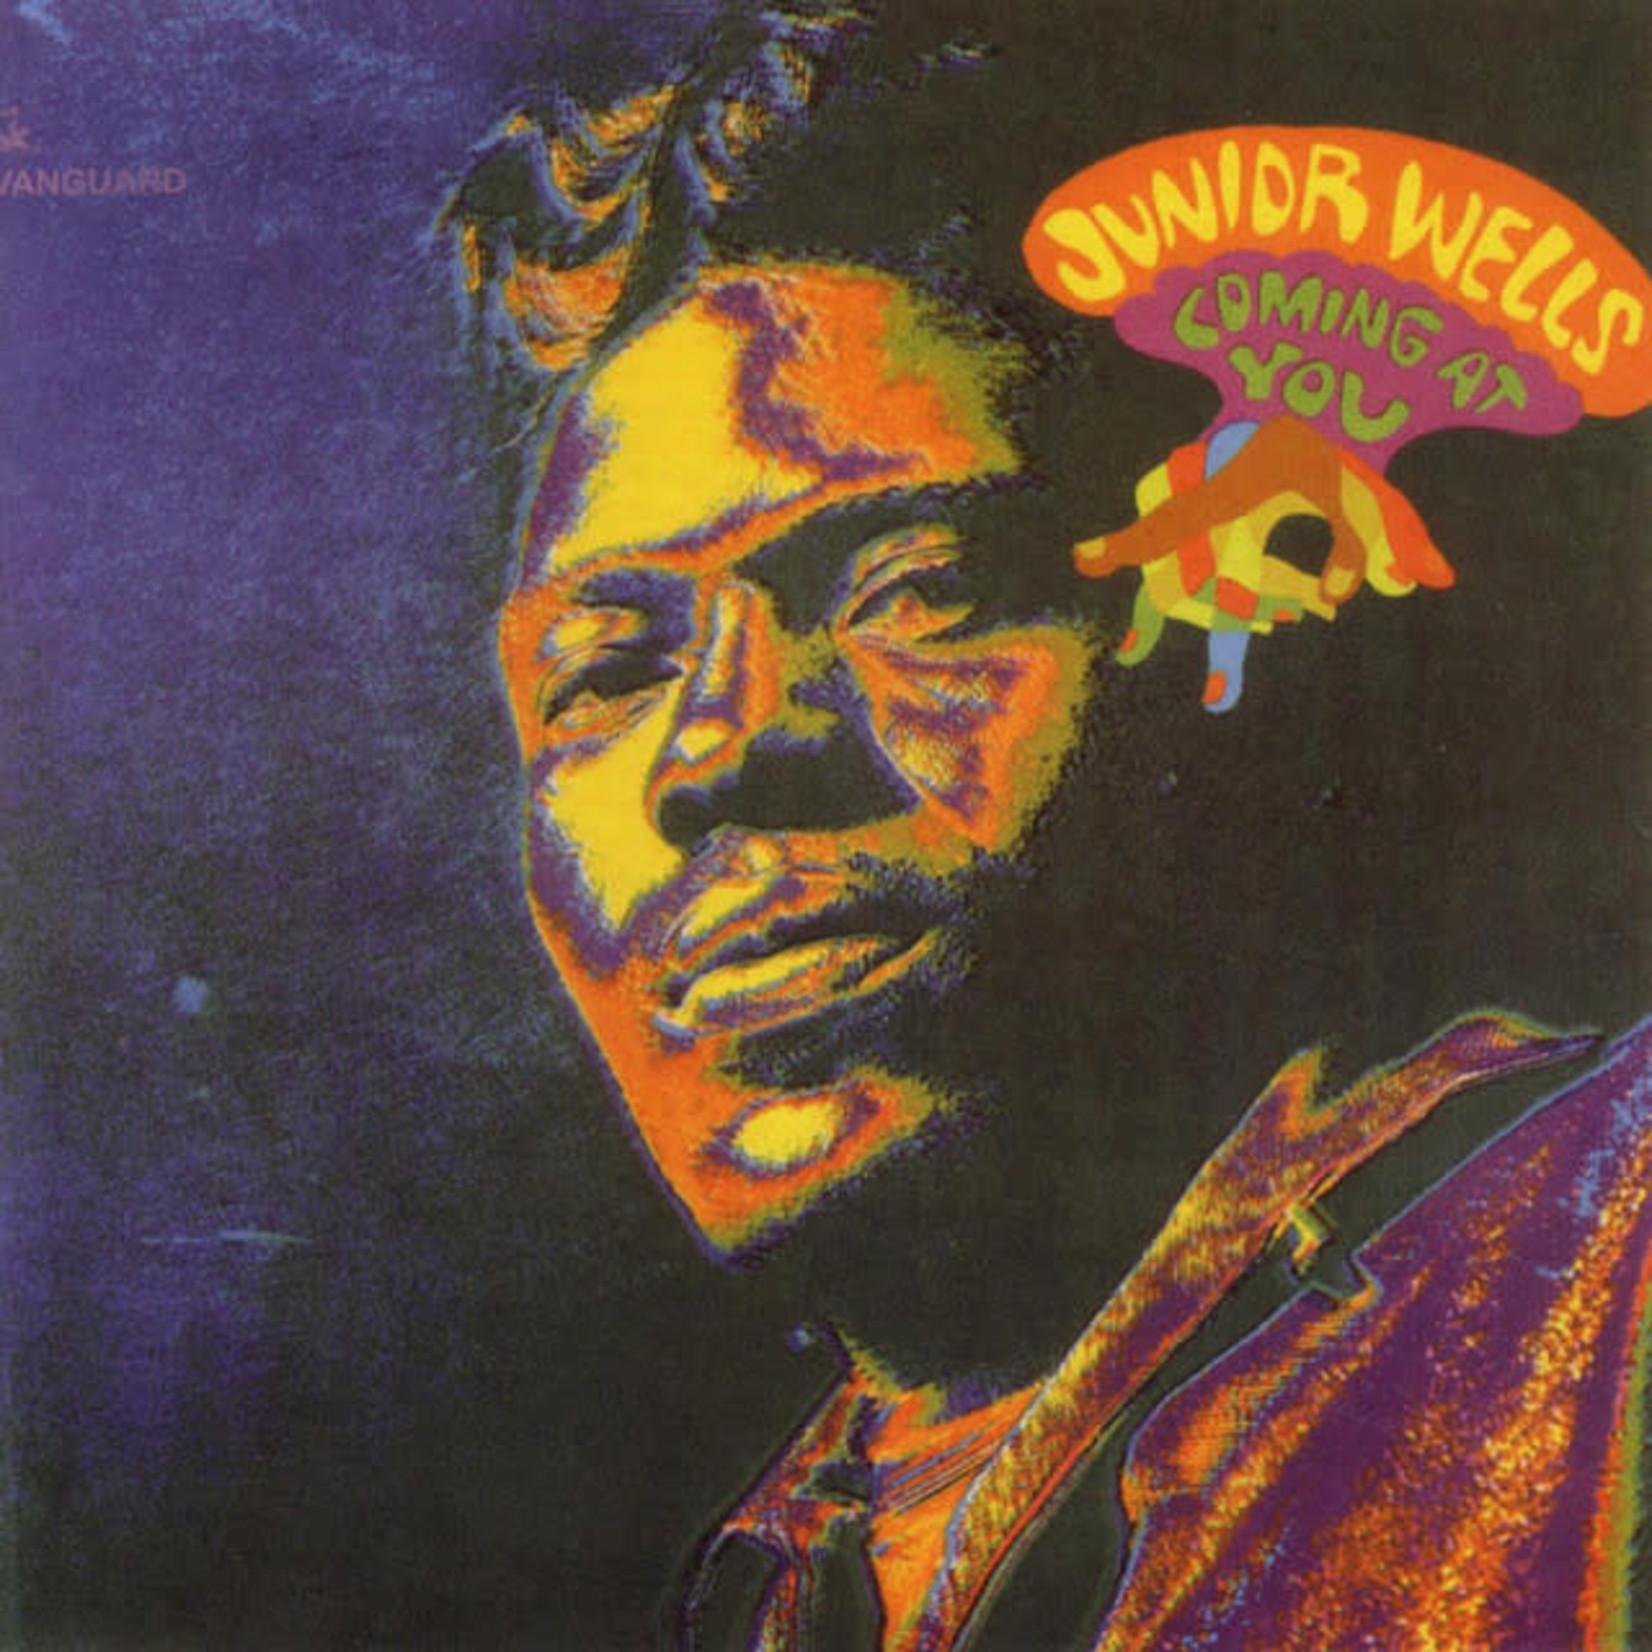 Vinyl Junior Wells - Coming At You